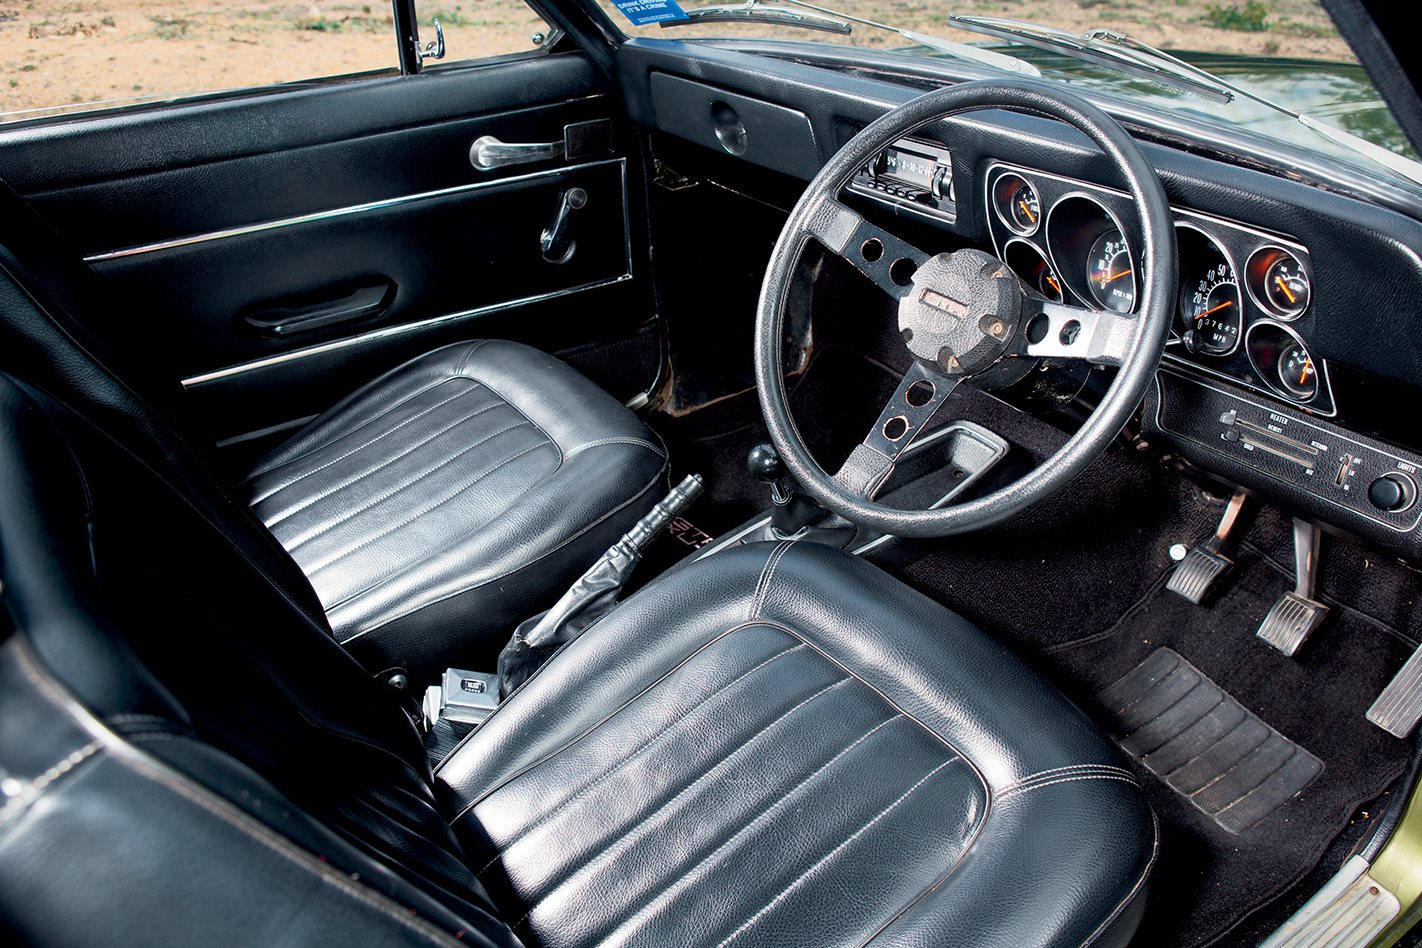 LJ-Torana-GTR-XU-1-interior.jpg